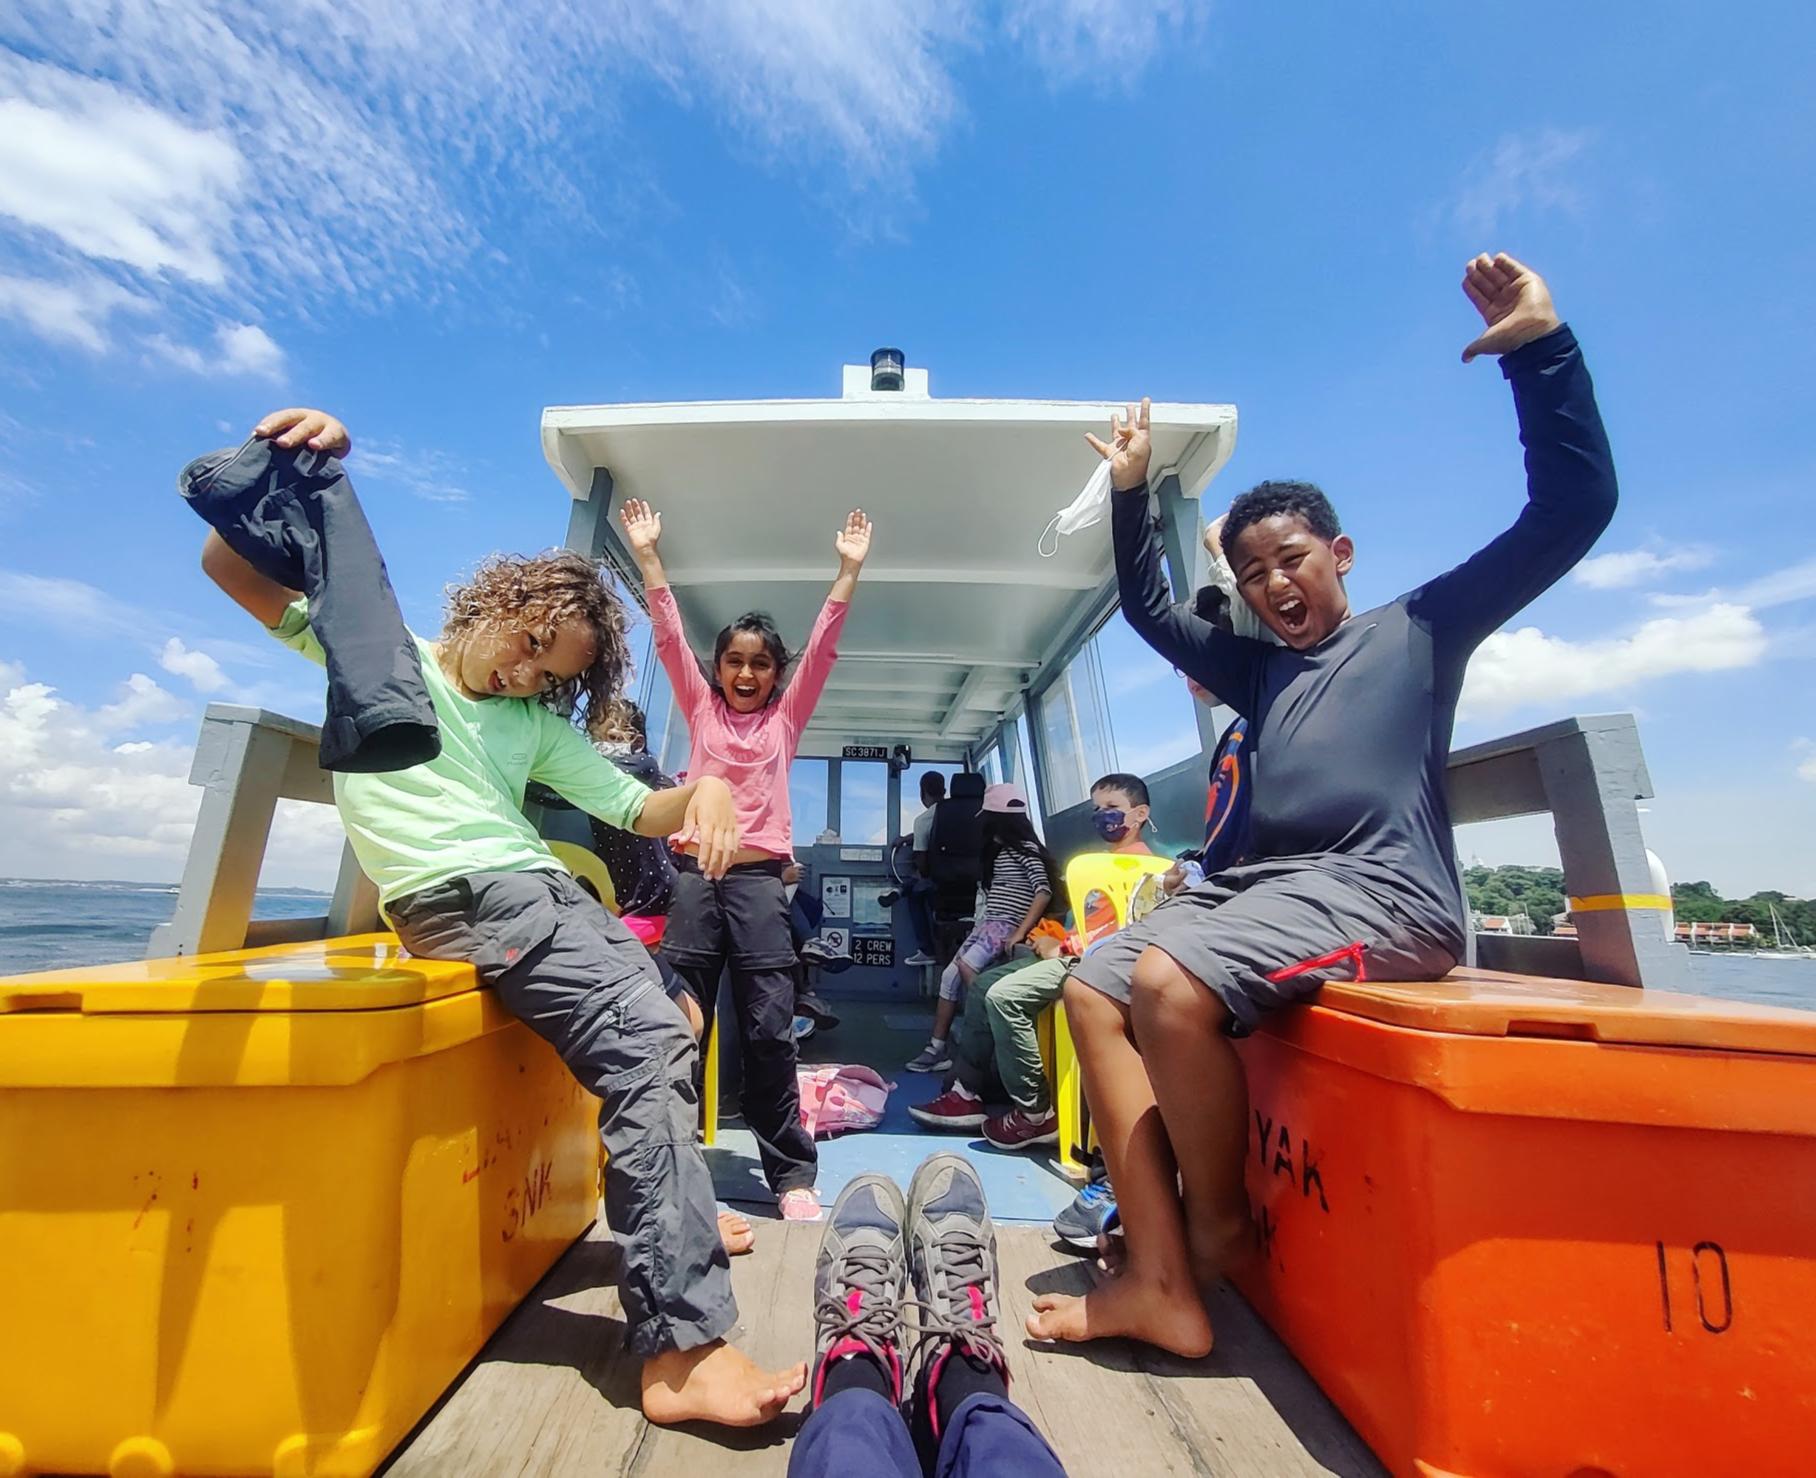 Pulau Ubin Excursion   6th Aug   Private